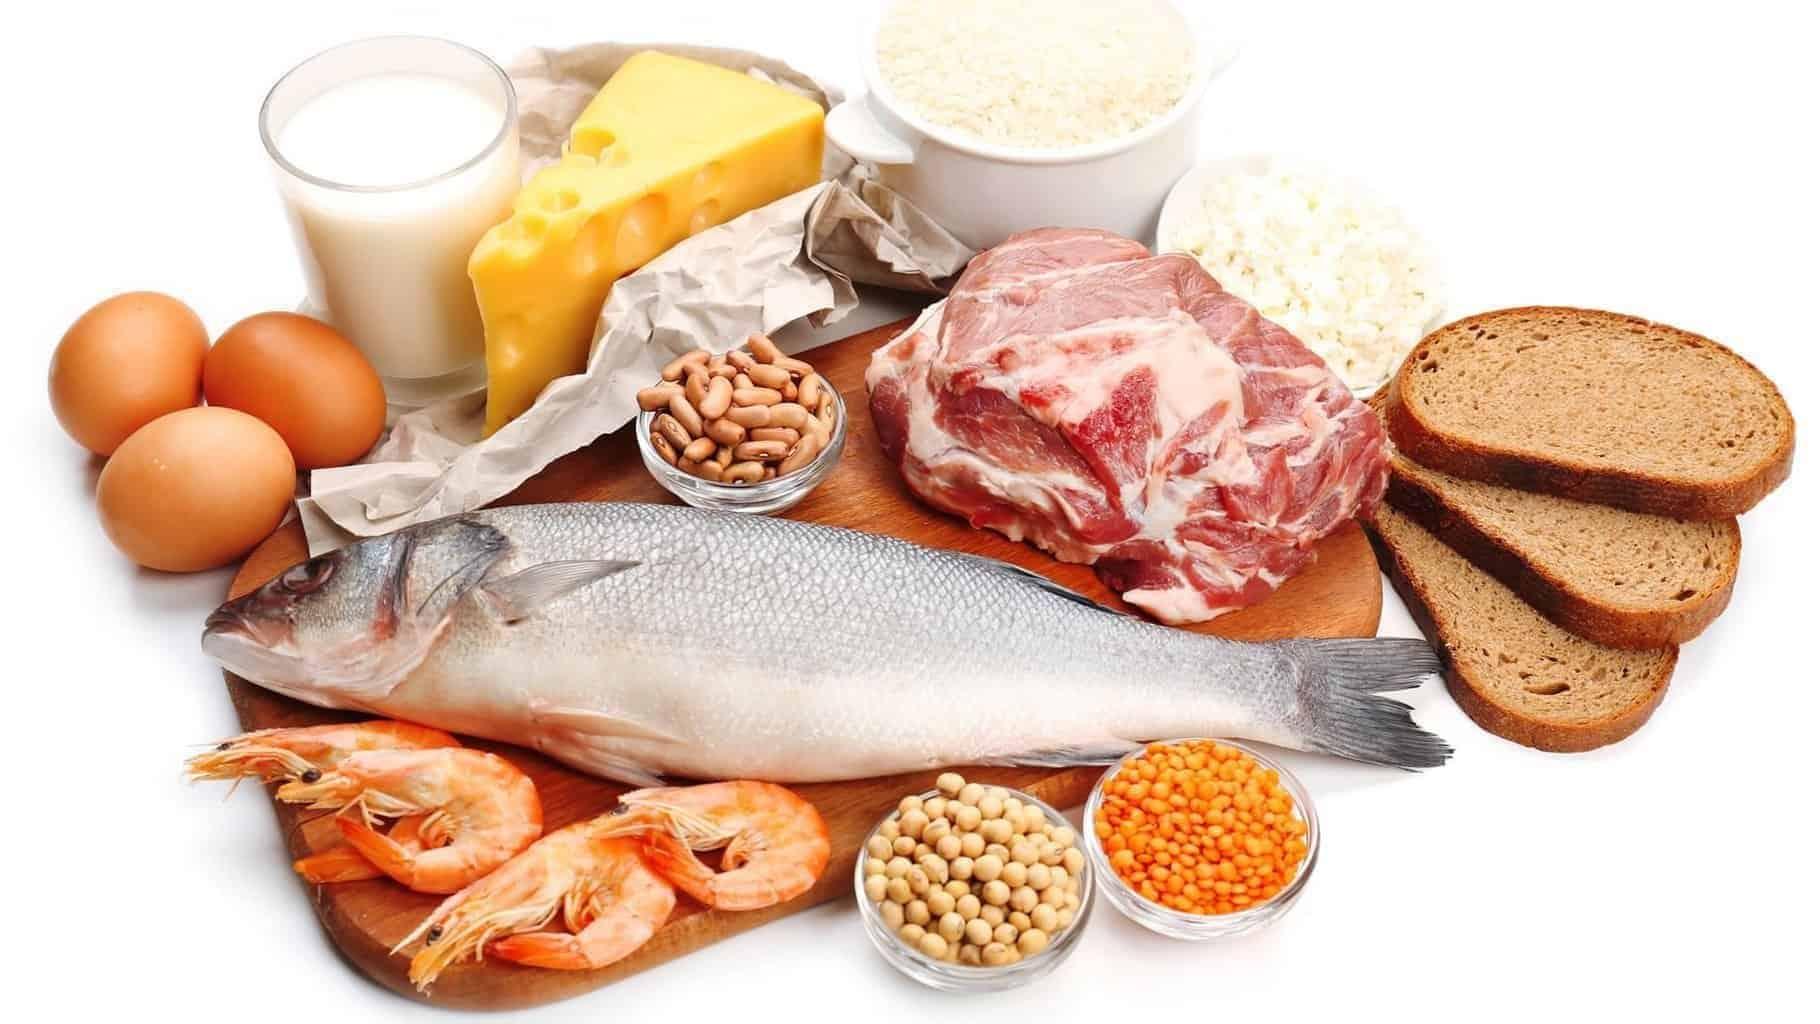 alimentos-con-proteinas-5081753-1802134-9108541